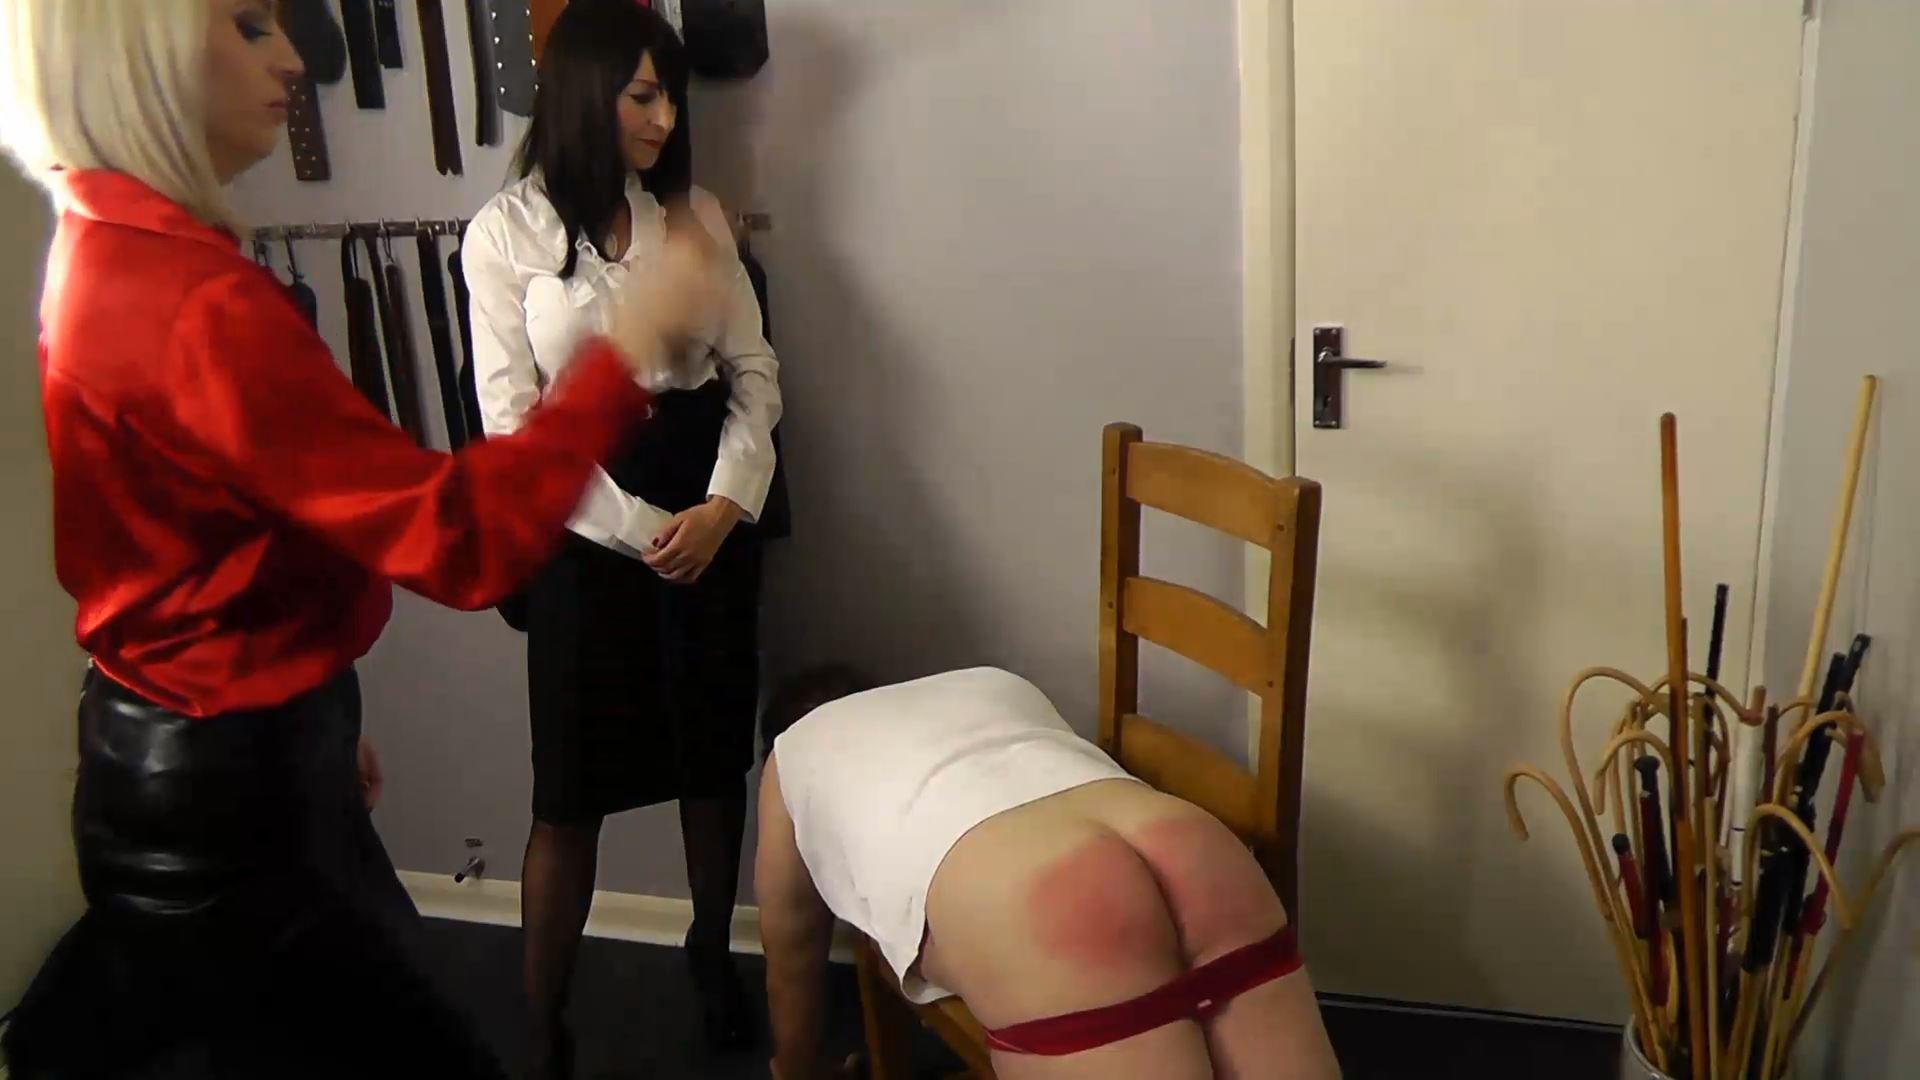 Jessica Wood In Scene: PE teacher in double trouble Part 2 - MISSJESSICAWOODVIDEOS - FULL HD/1080p/MP4